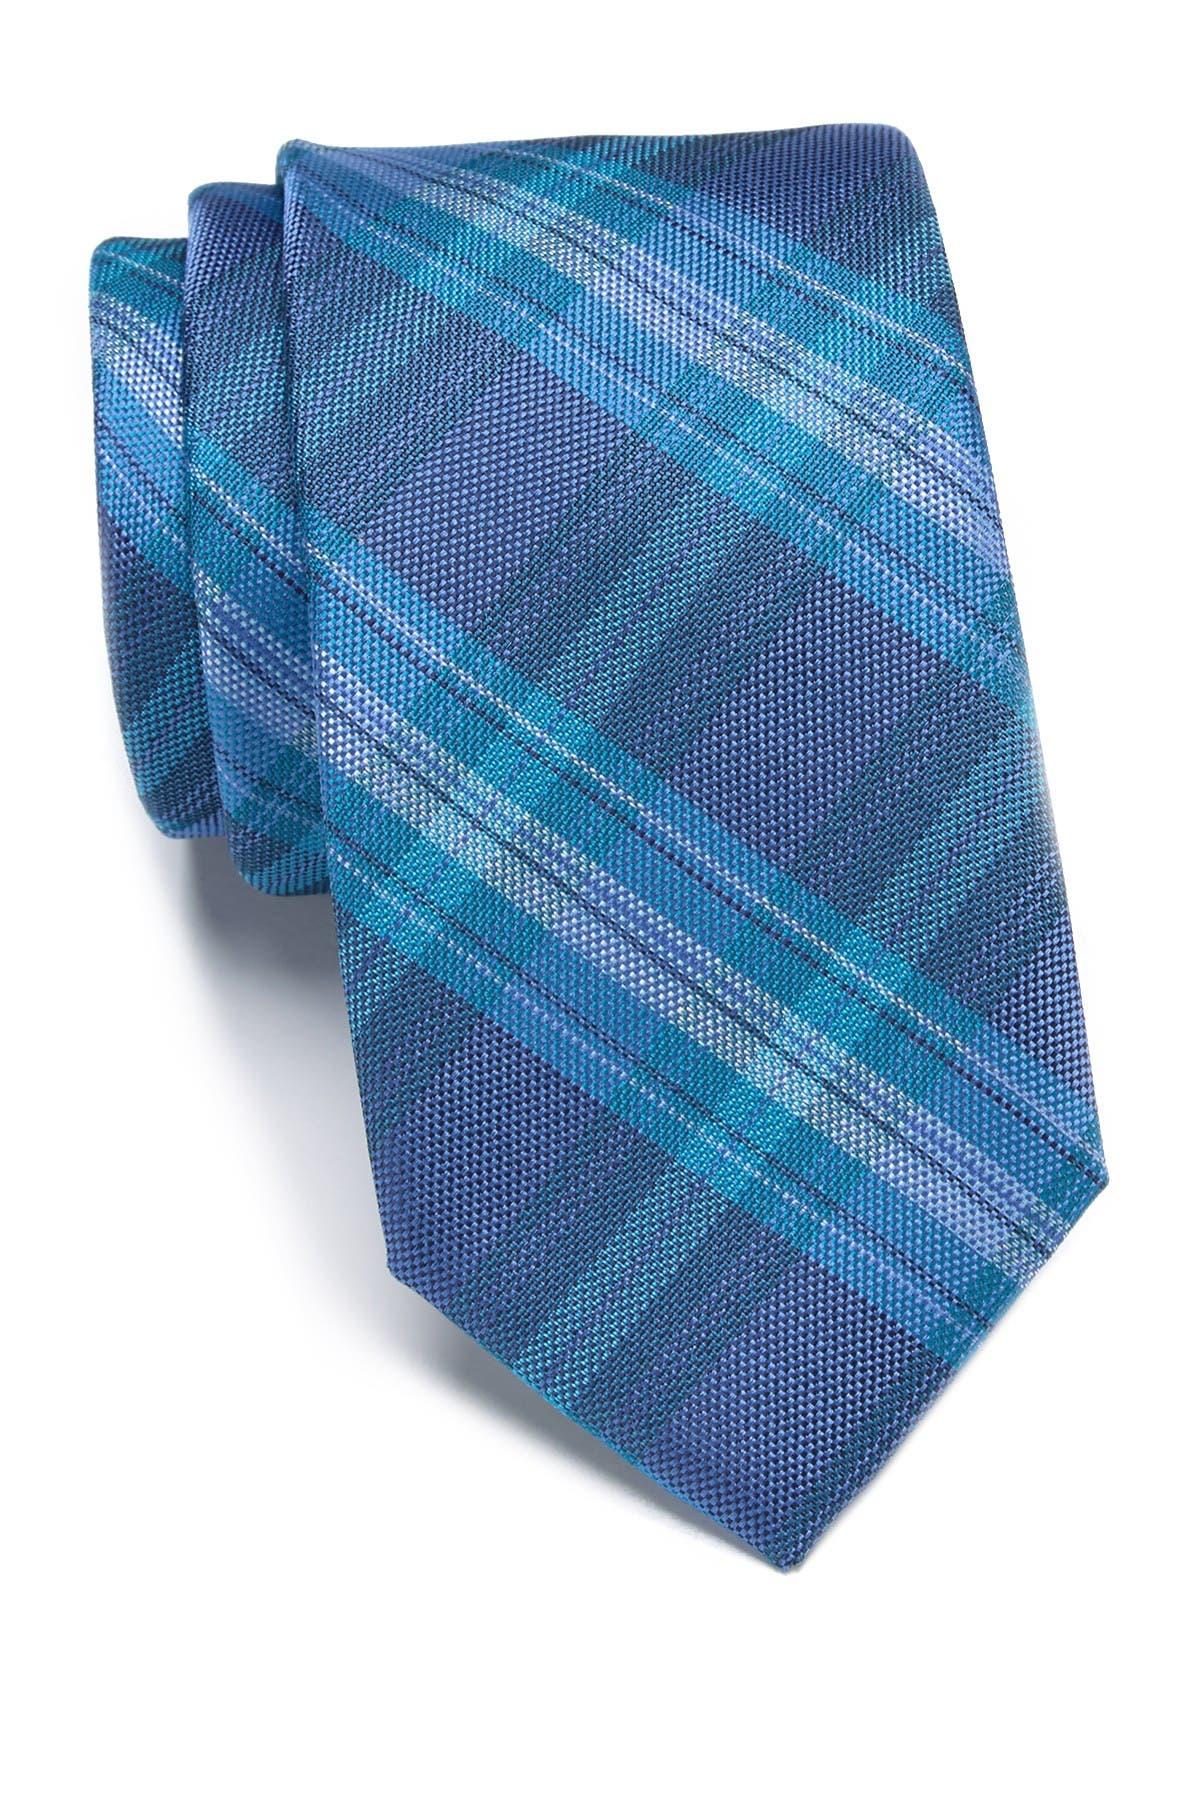 Image of 14th & Union Abney Plaid  Tie